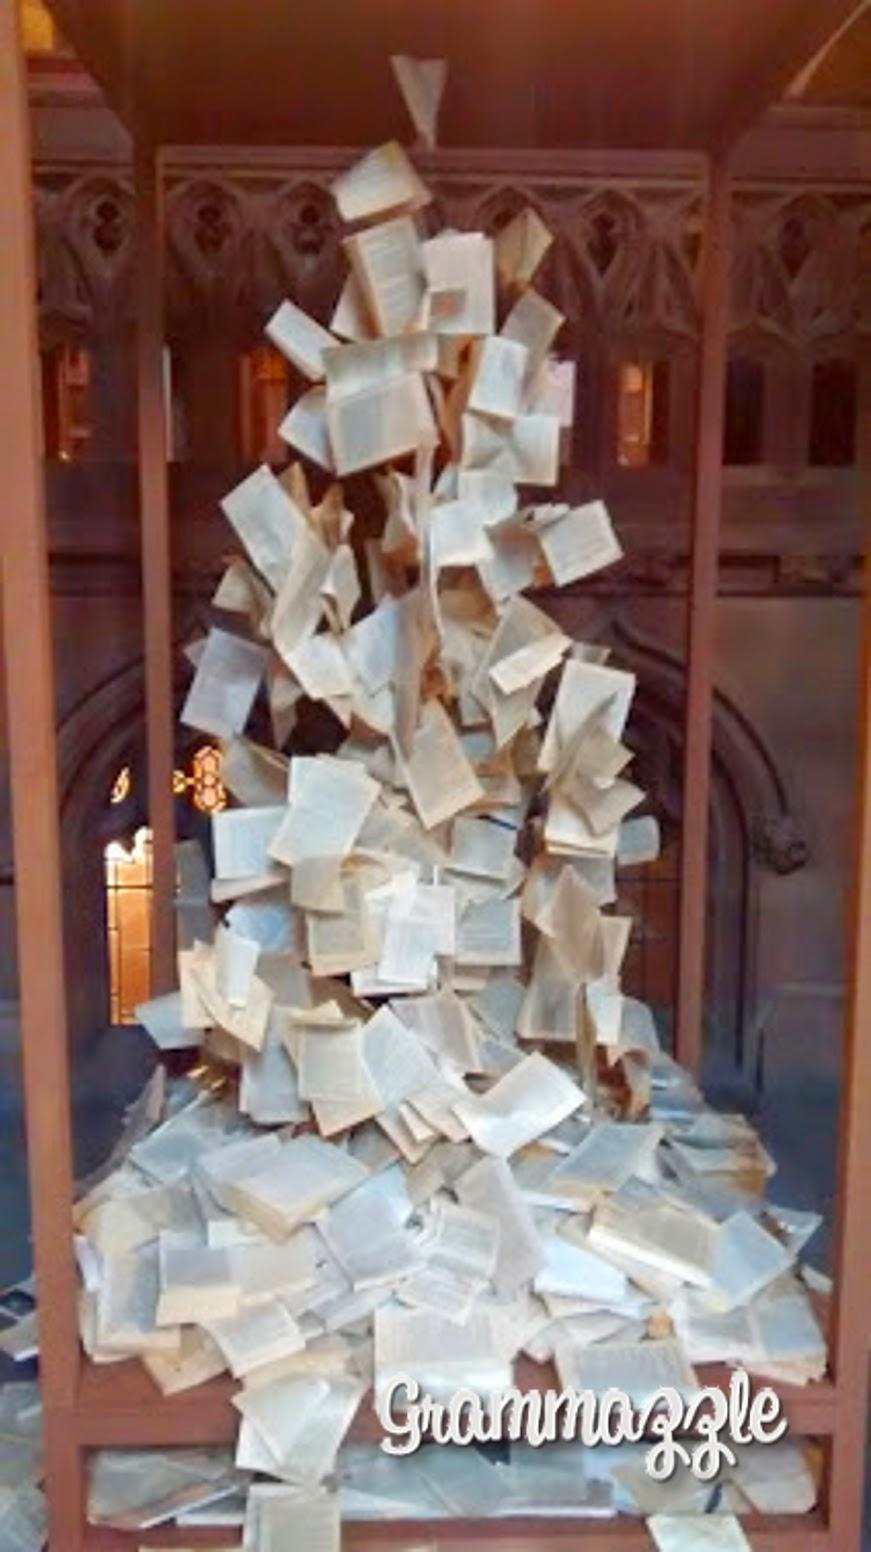 Grammazzle Libros Books